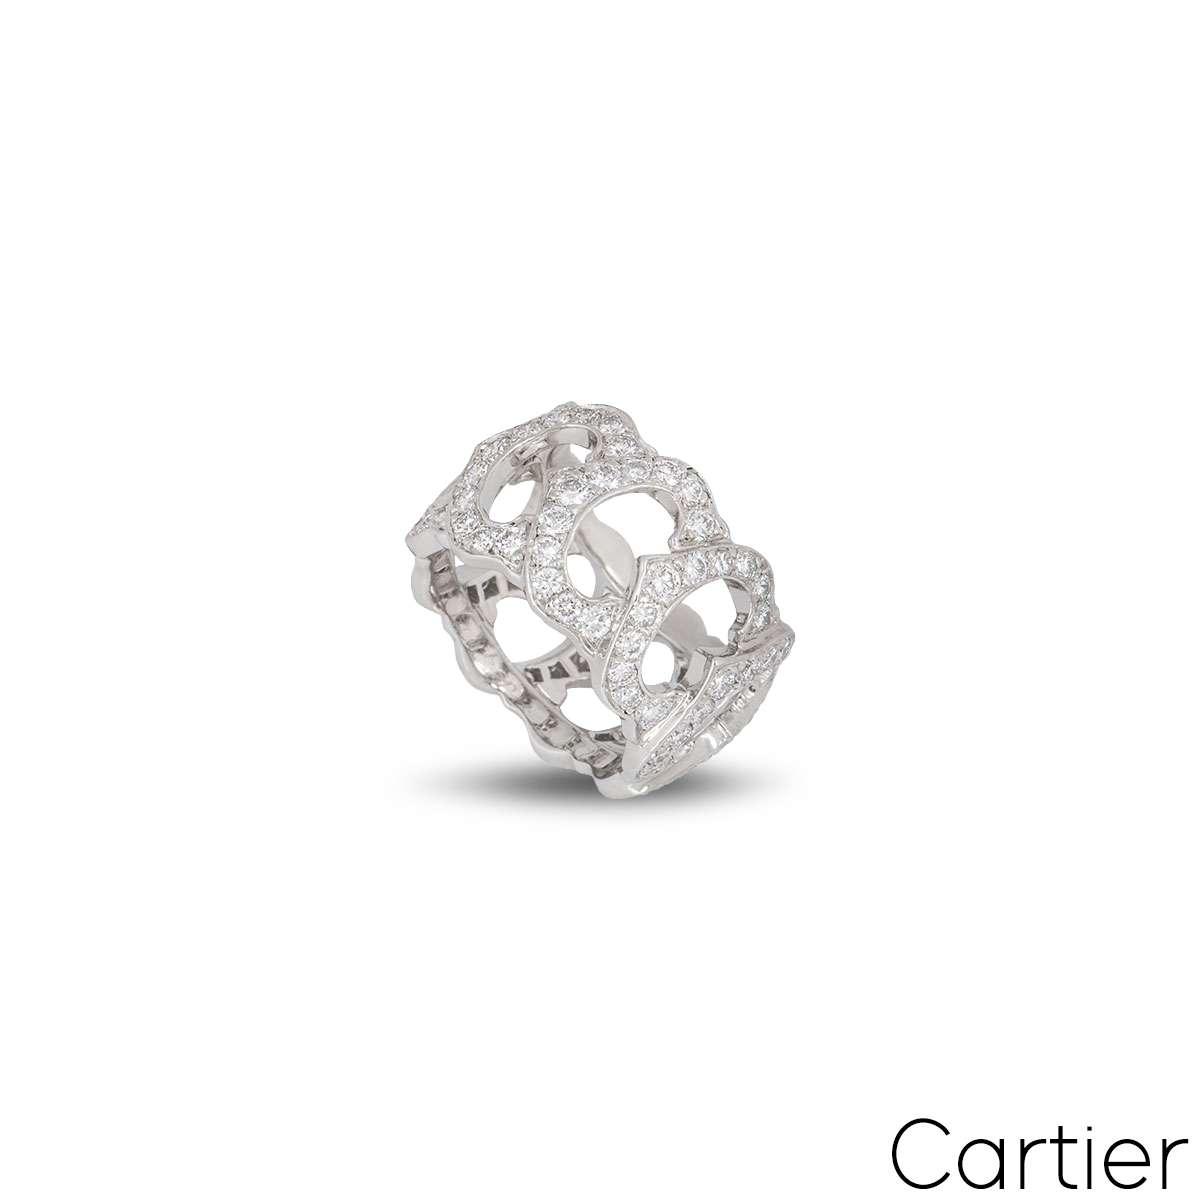 Cartier White Gold Dimaond C de Cartier Ring